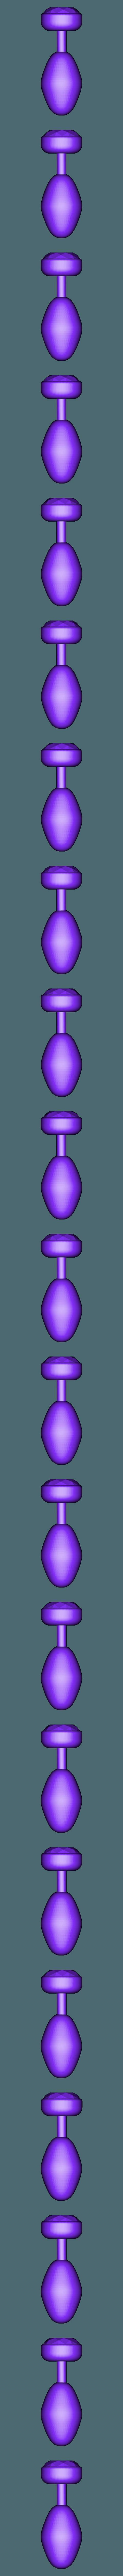 Rosebud L.STL Download STL file PLUG ANAL L • 3D printer object, 3dprintcreation